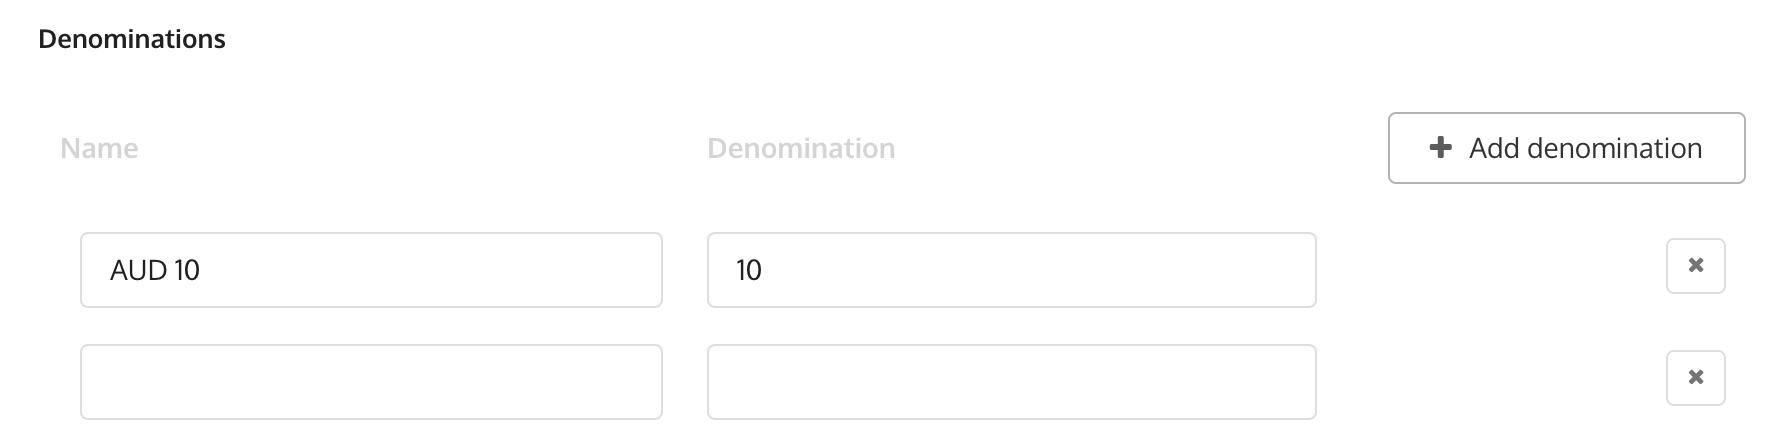 Adding denominations